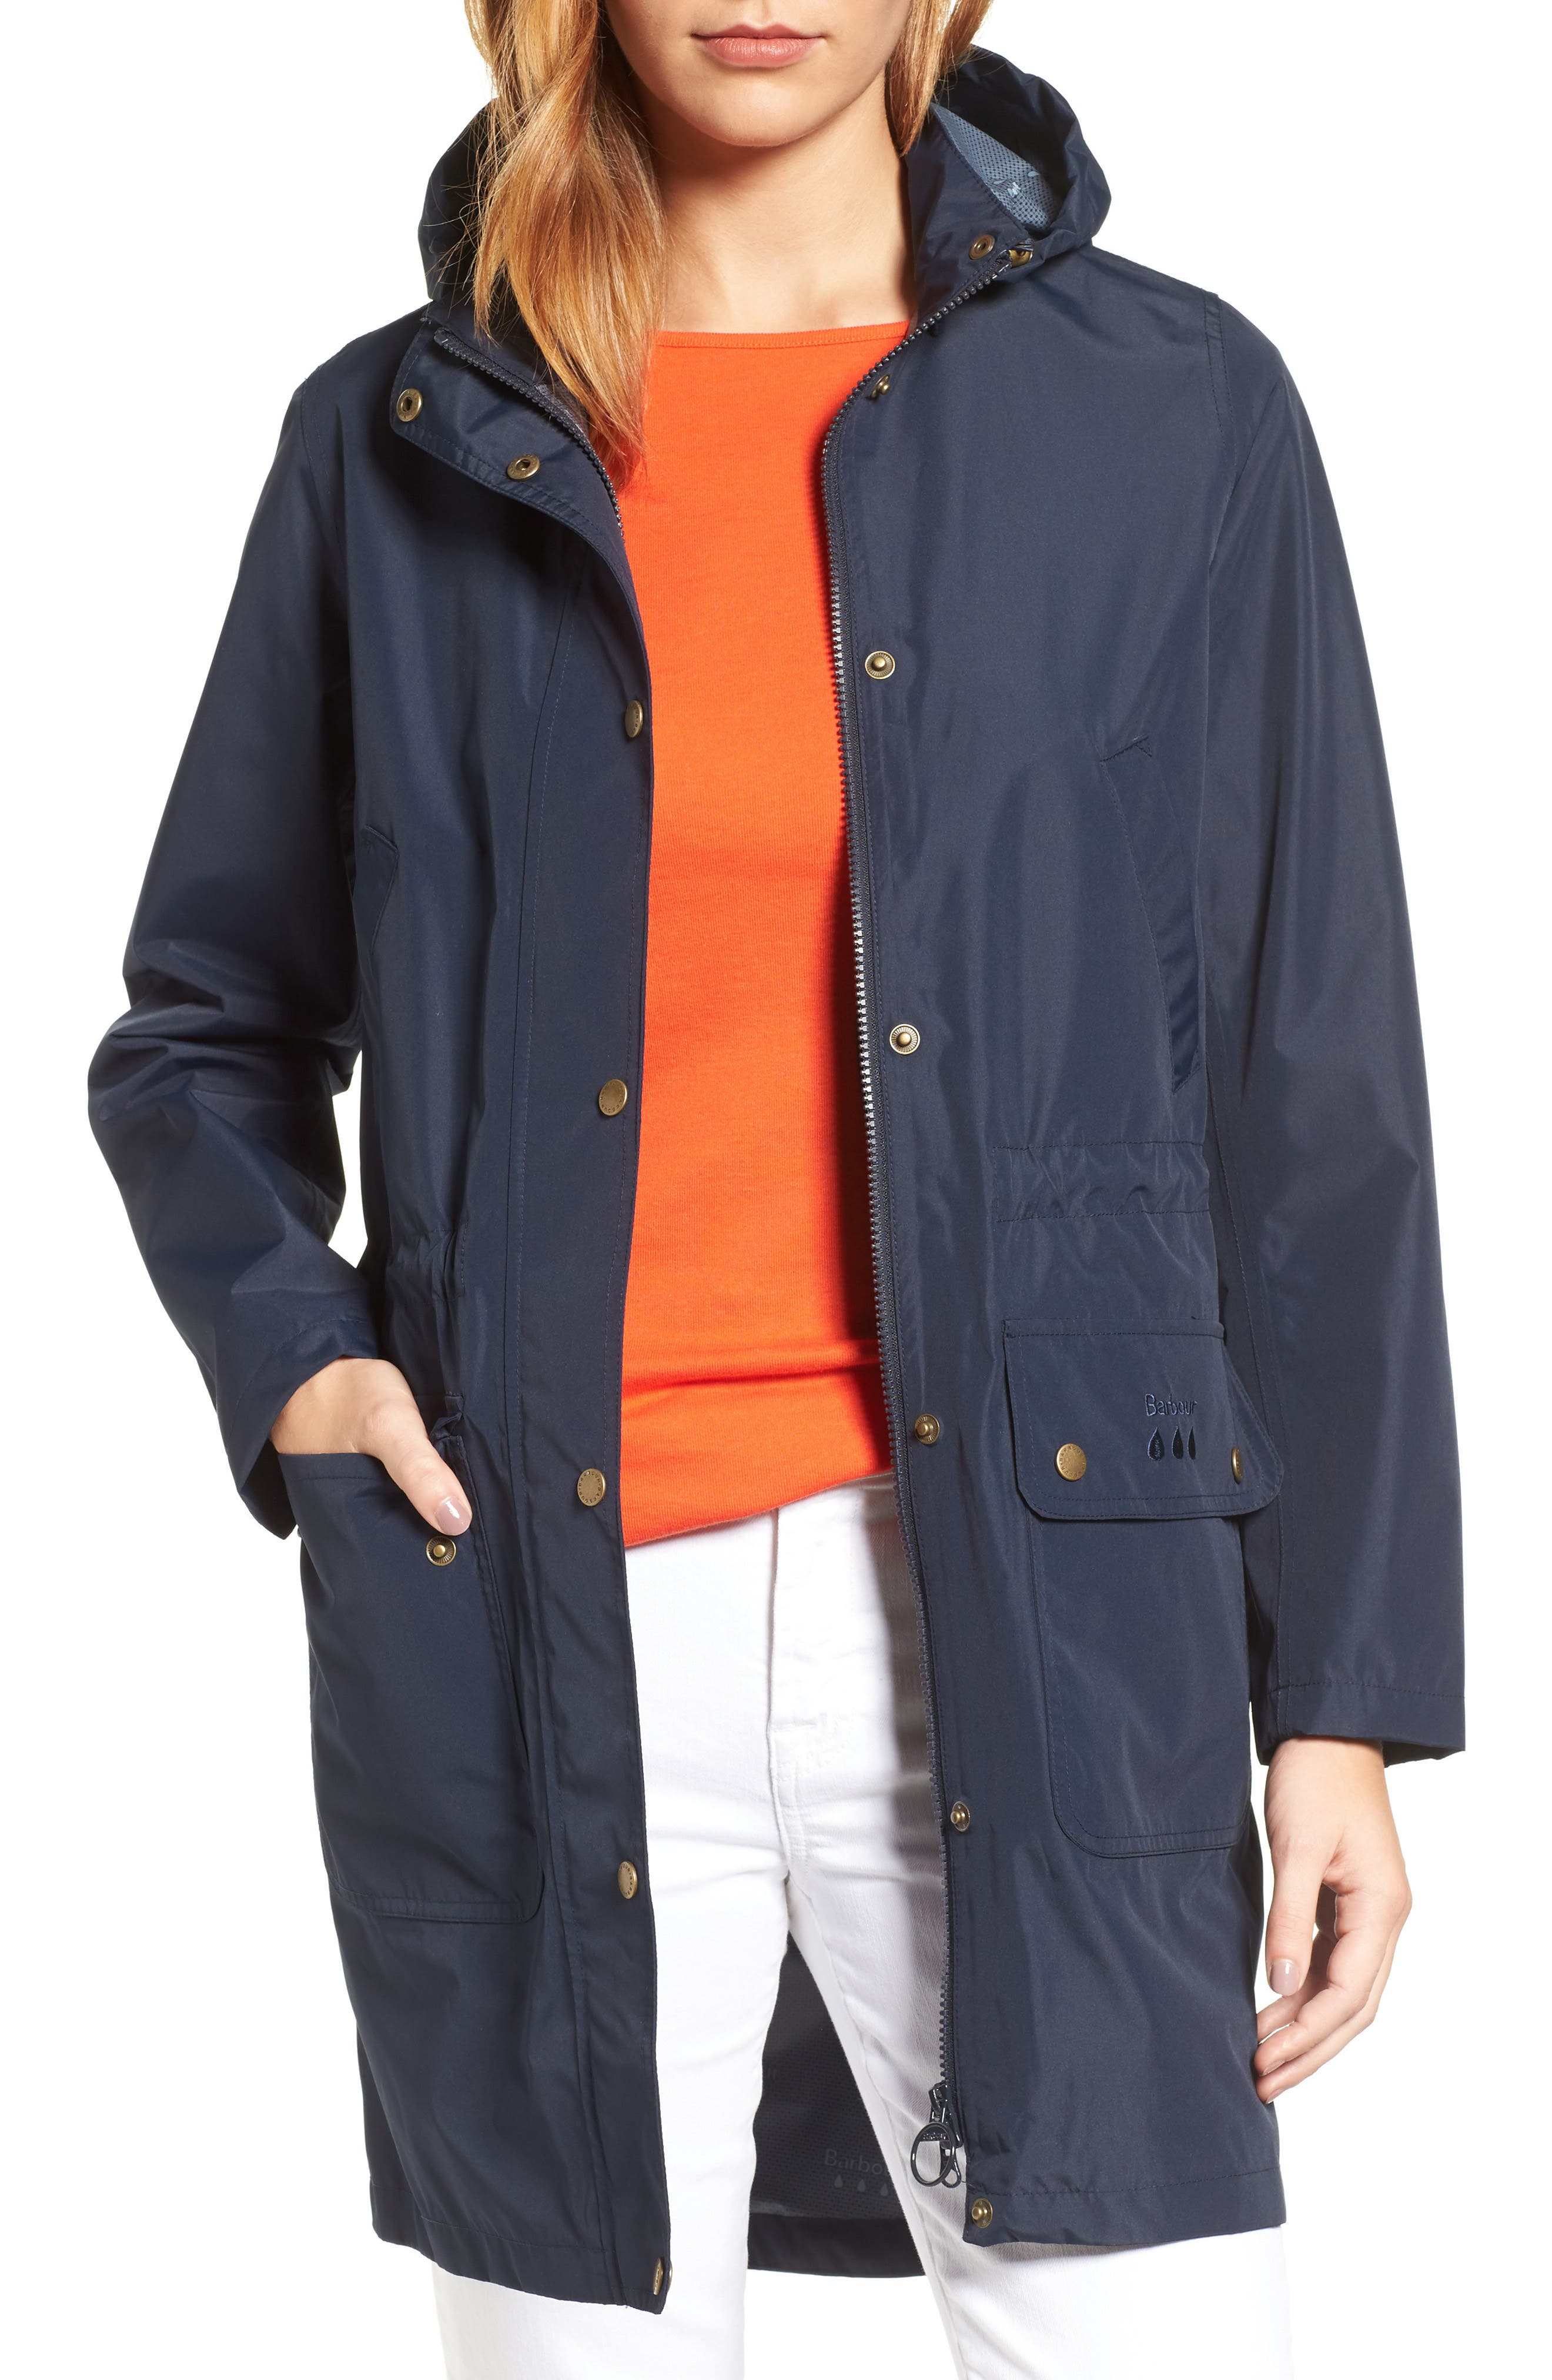 Barbour Katabatic Waterproof Rain Jacket